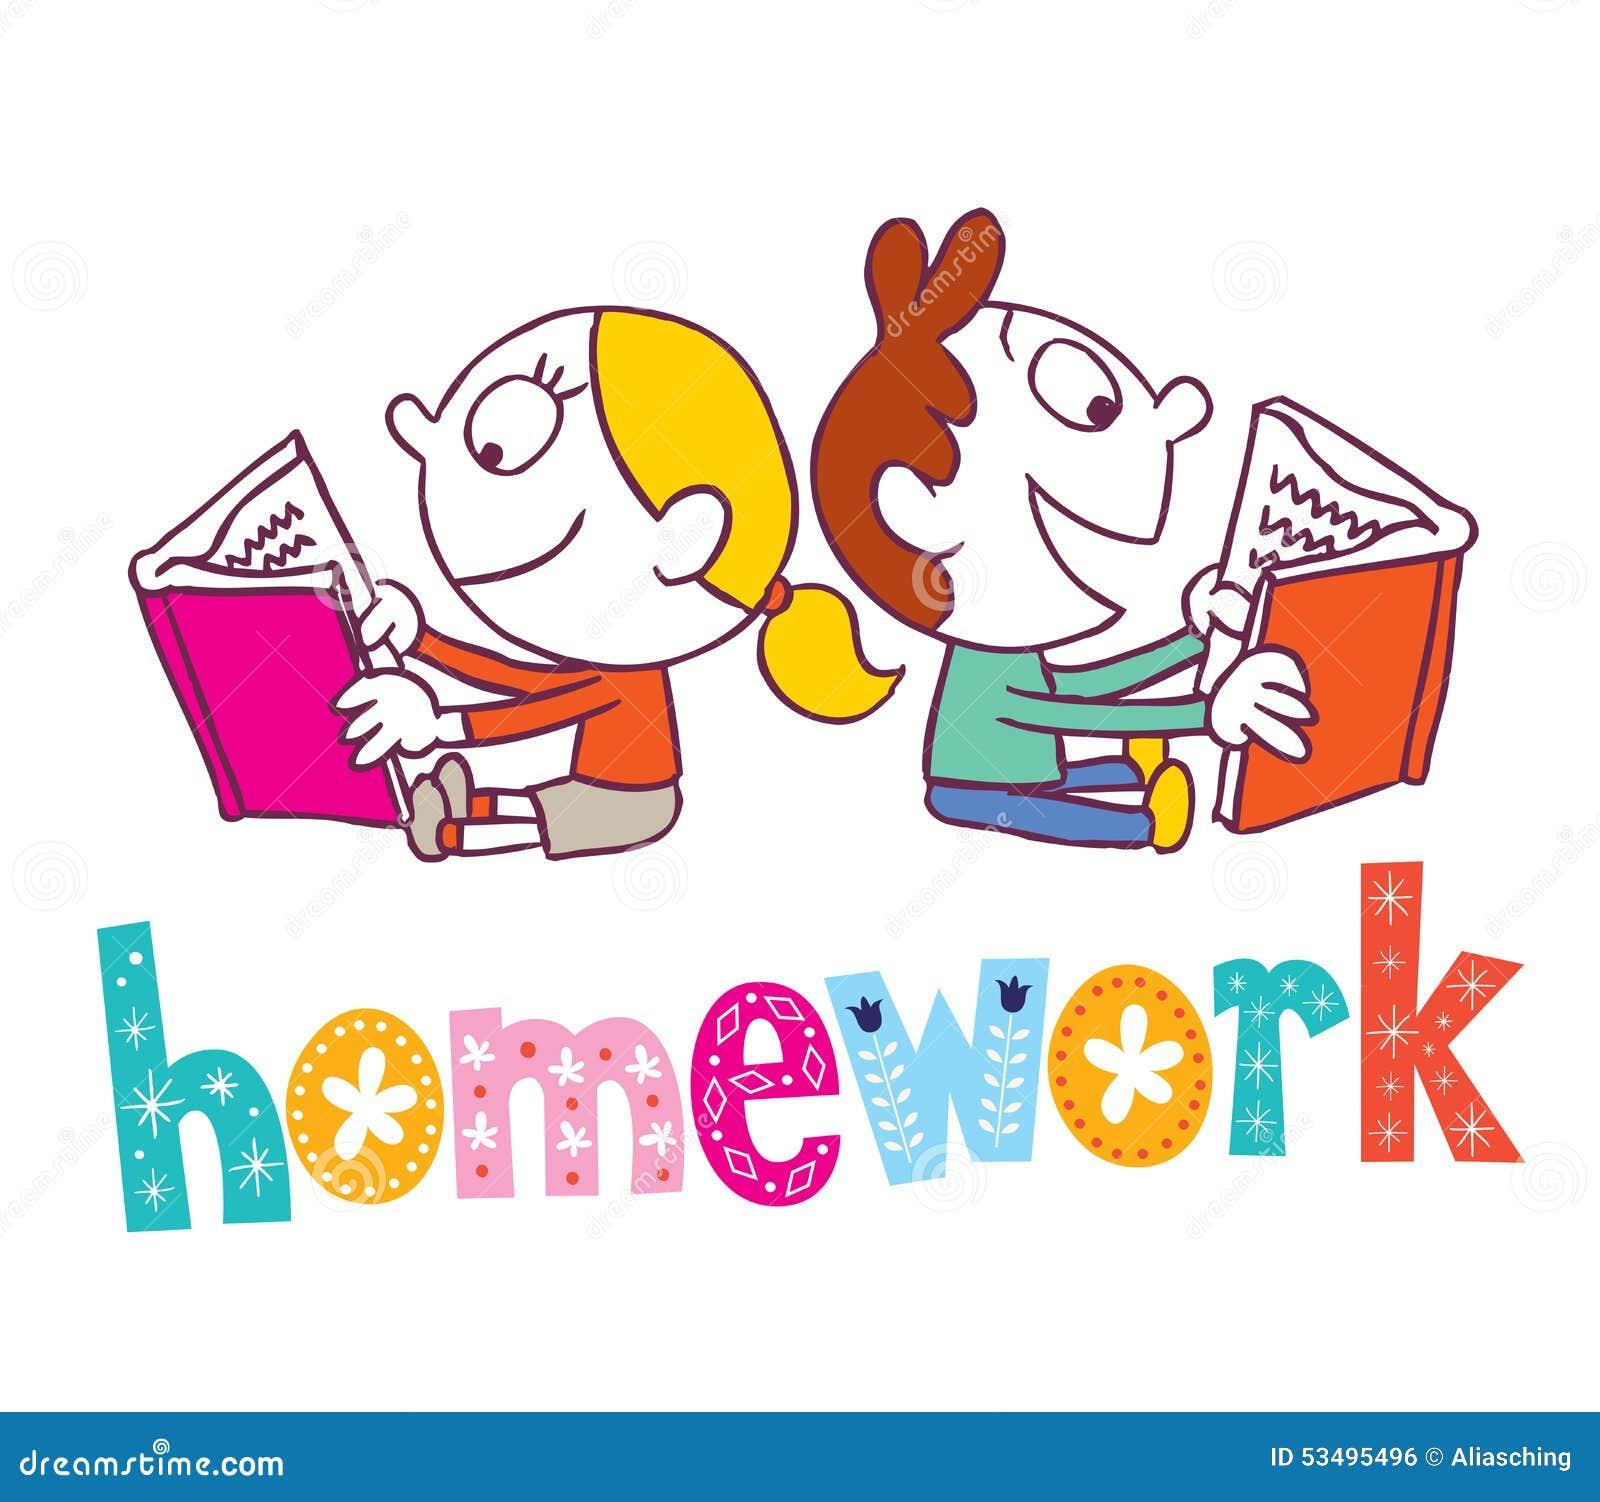 Parenting practices and adolescent risk behaviors professional essay writers